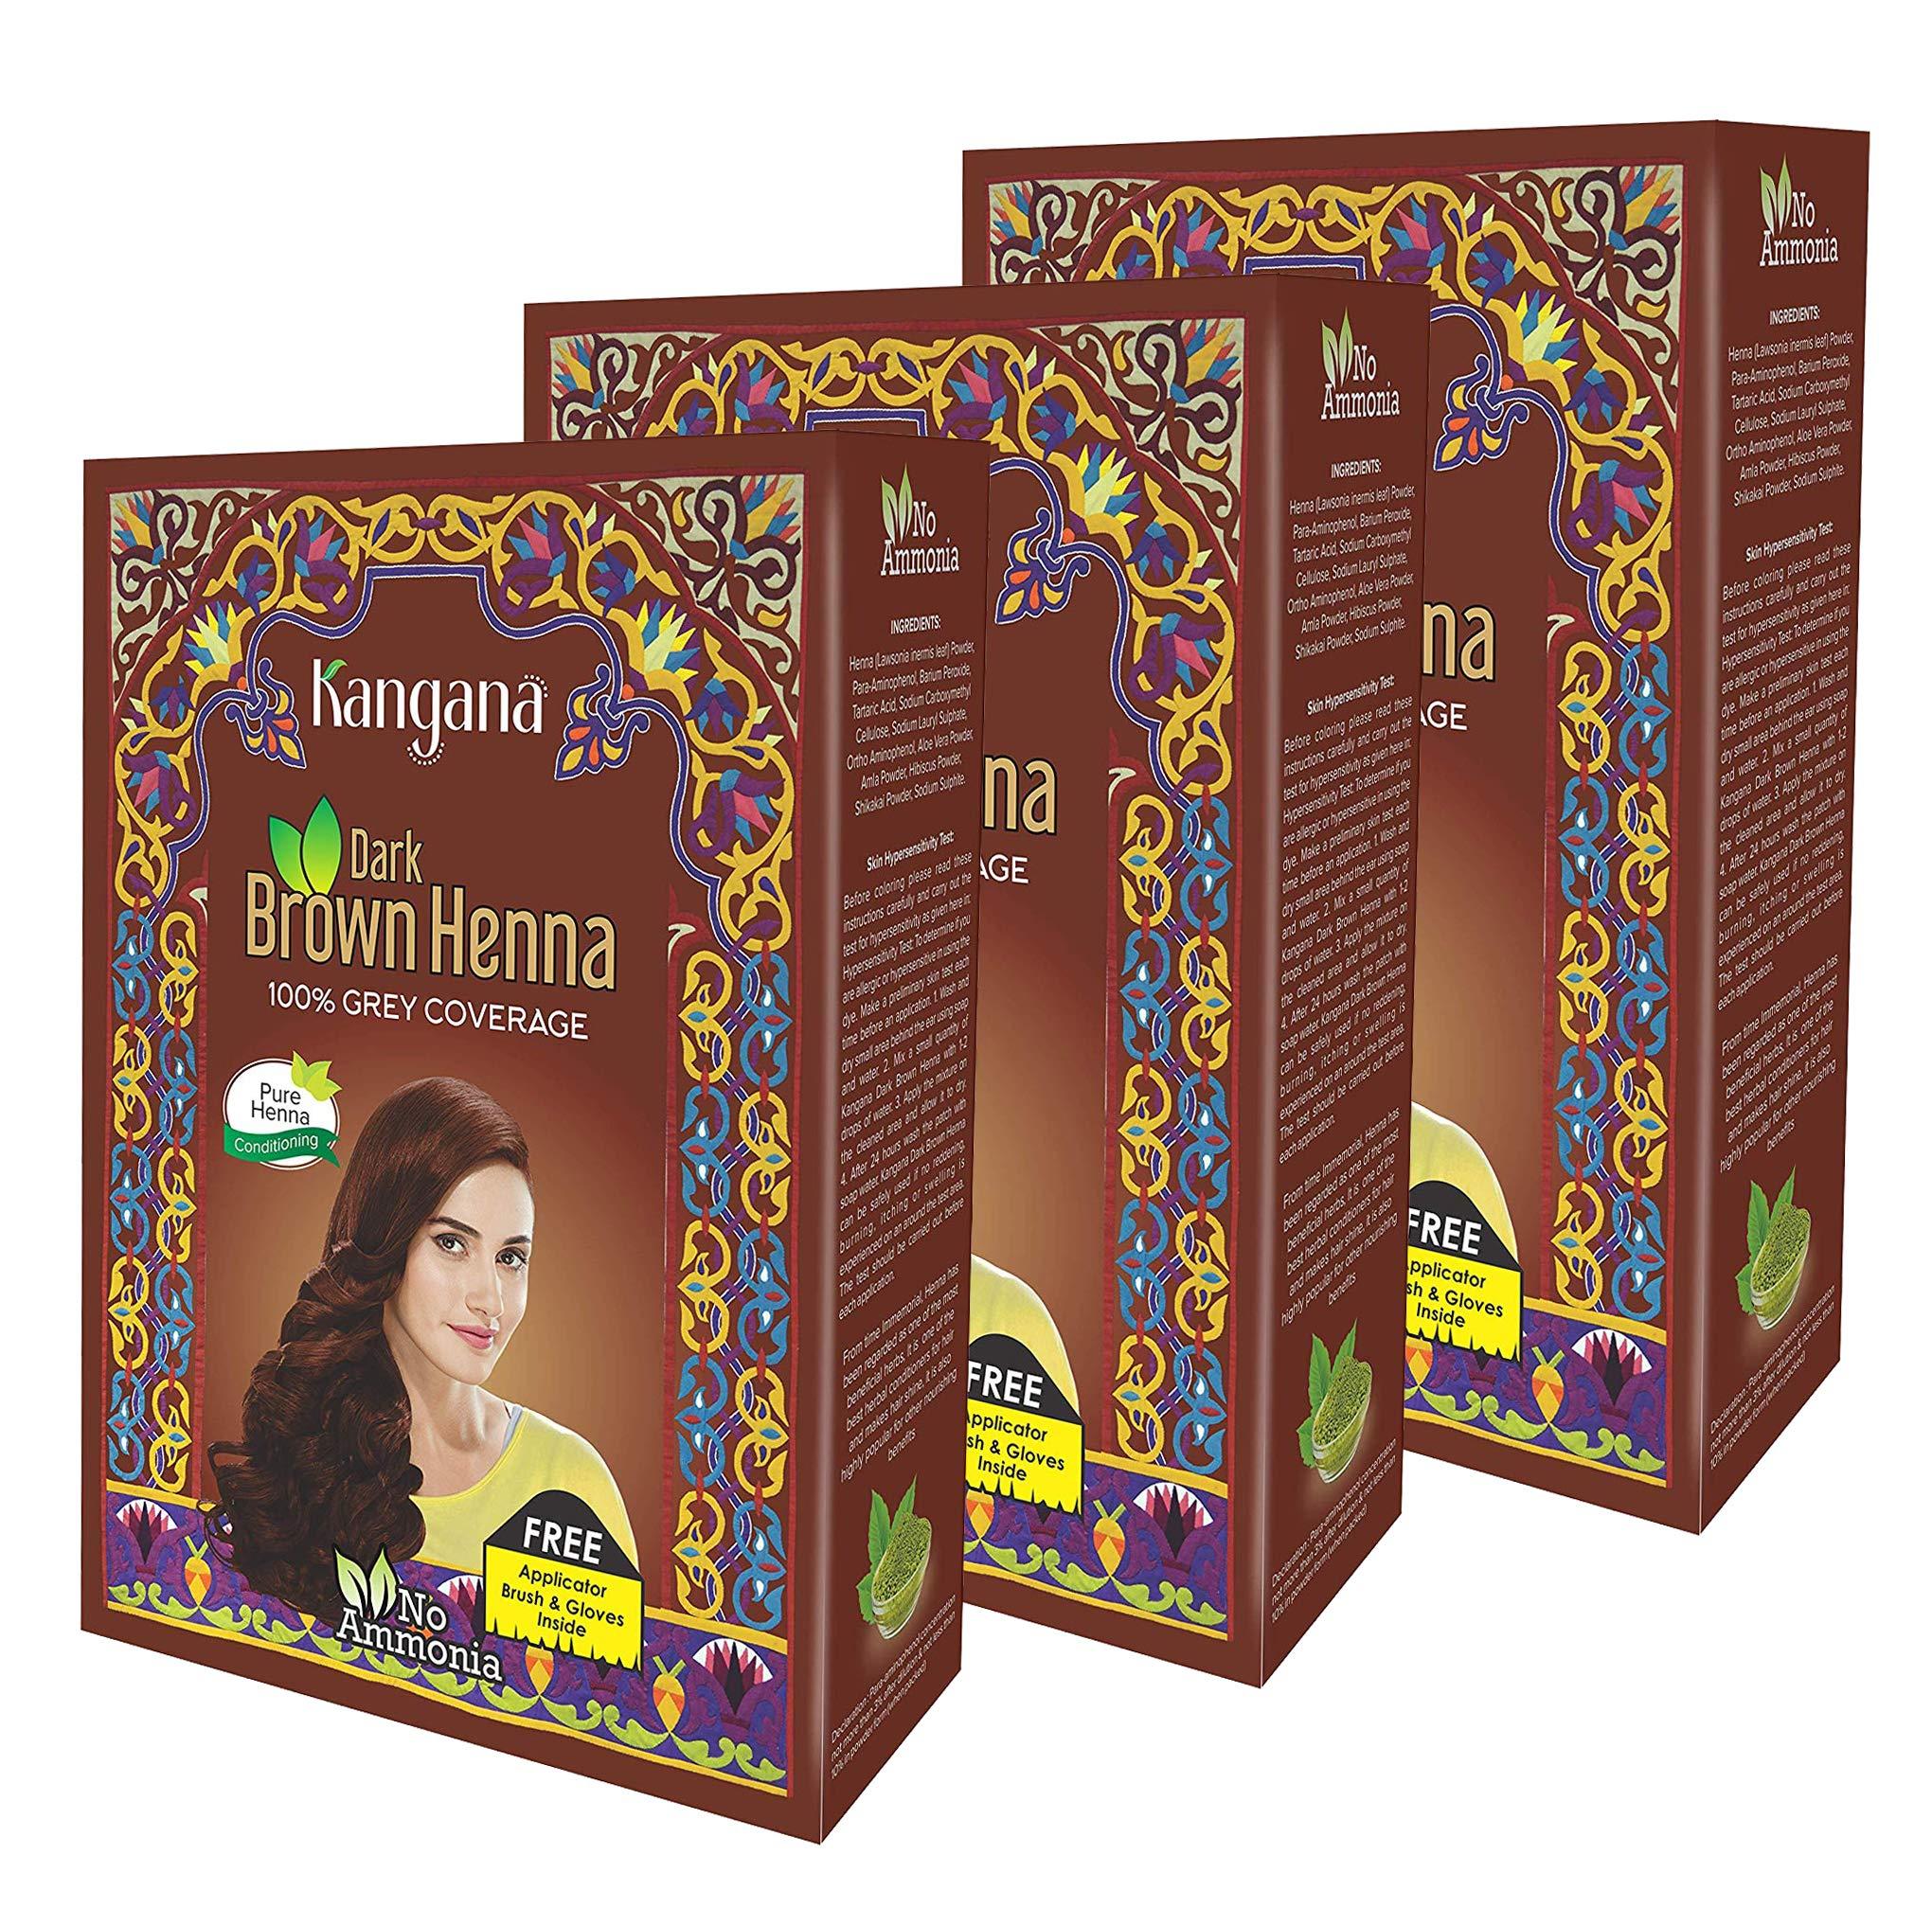 Kangana Henna Powder for Hair Dye/Colour - Dark Brown Henna Powder for 100% Grey Coverage- 6 Pouches Each - Total 180g (6.34 Oz)- Pack of 3 by Kangana